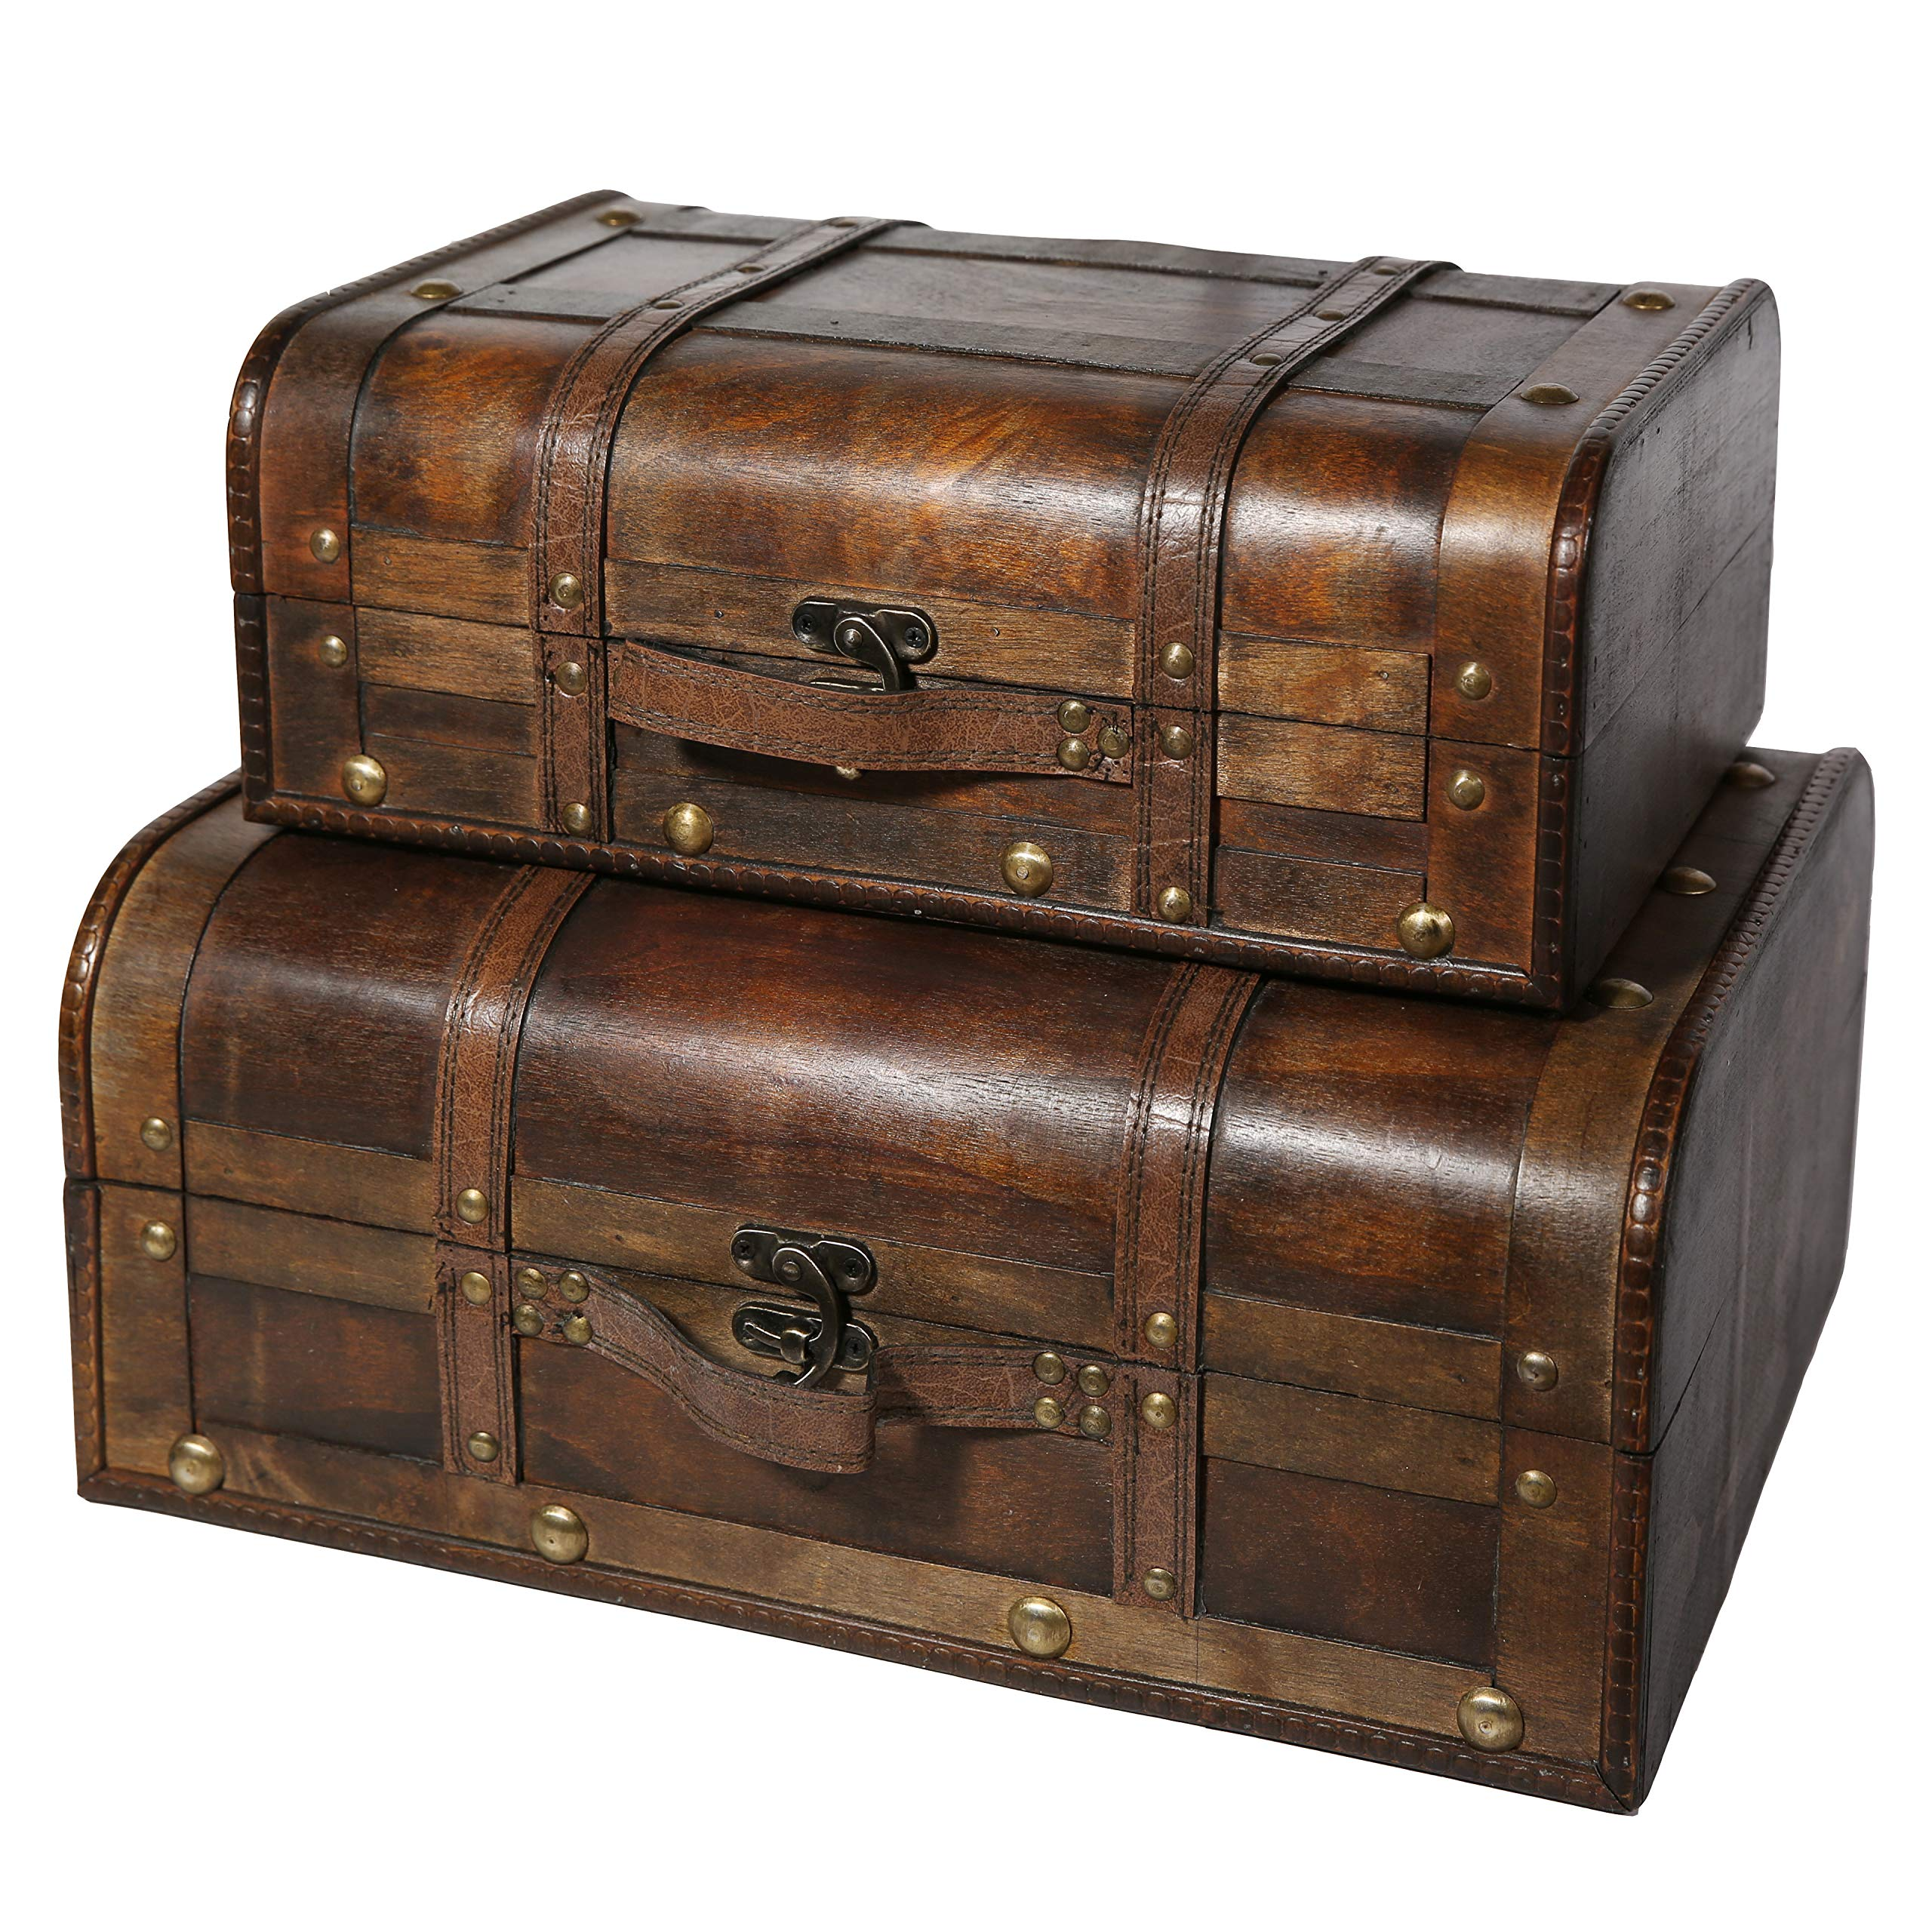 Soul & Lane Bentley Decorative Wooden Vintage Suitcases (Set of 2) | Storage Trunk Chest for Decoration Parties Decor by Soul & Lane